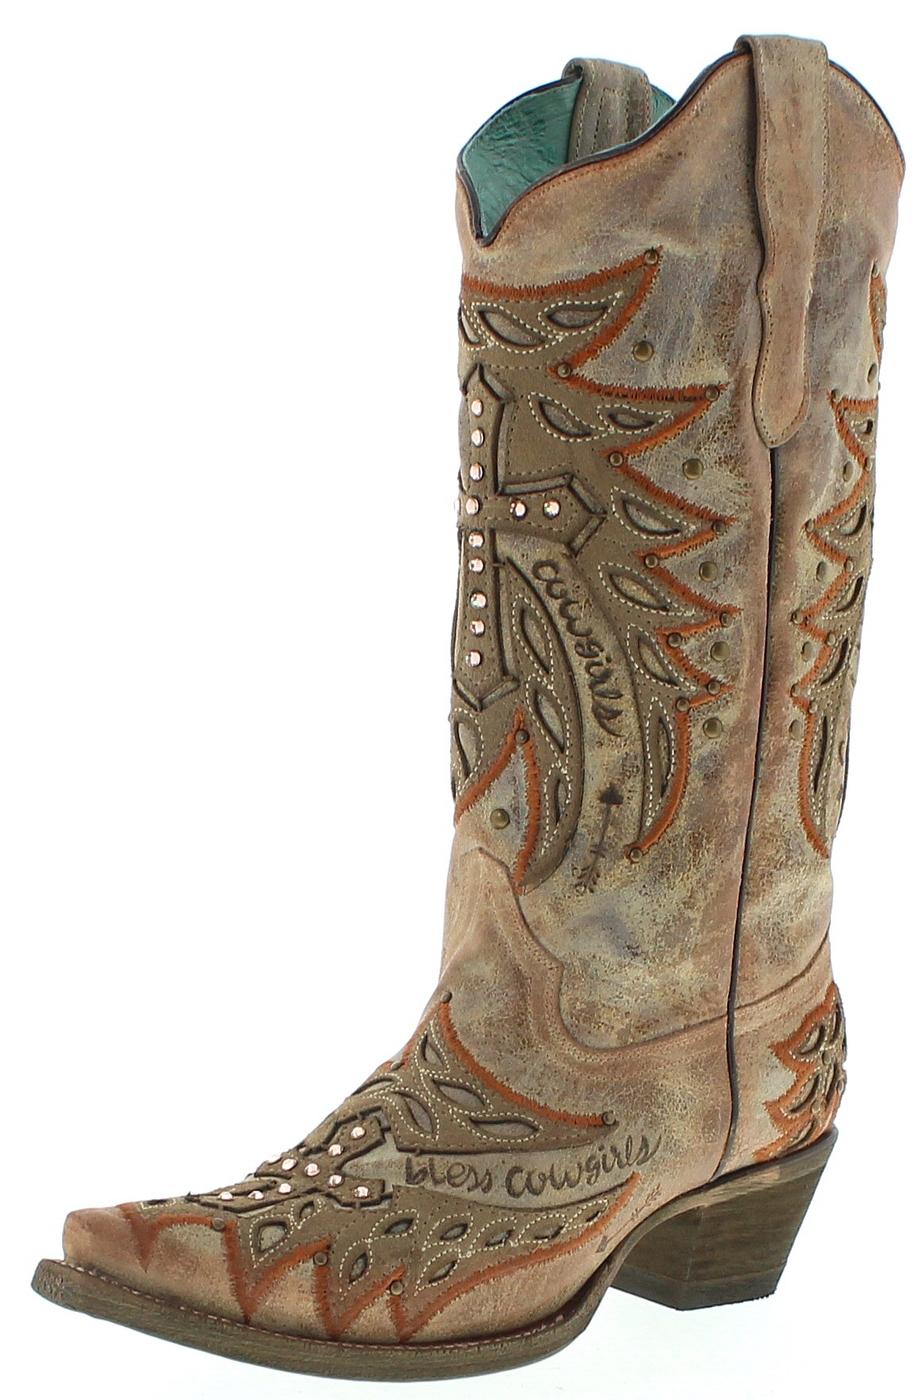 Corral Boots E1346 Bone Ladies western boots - beige